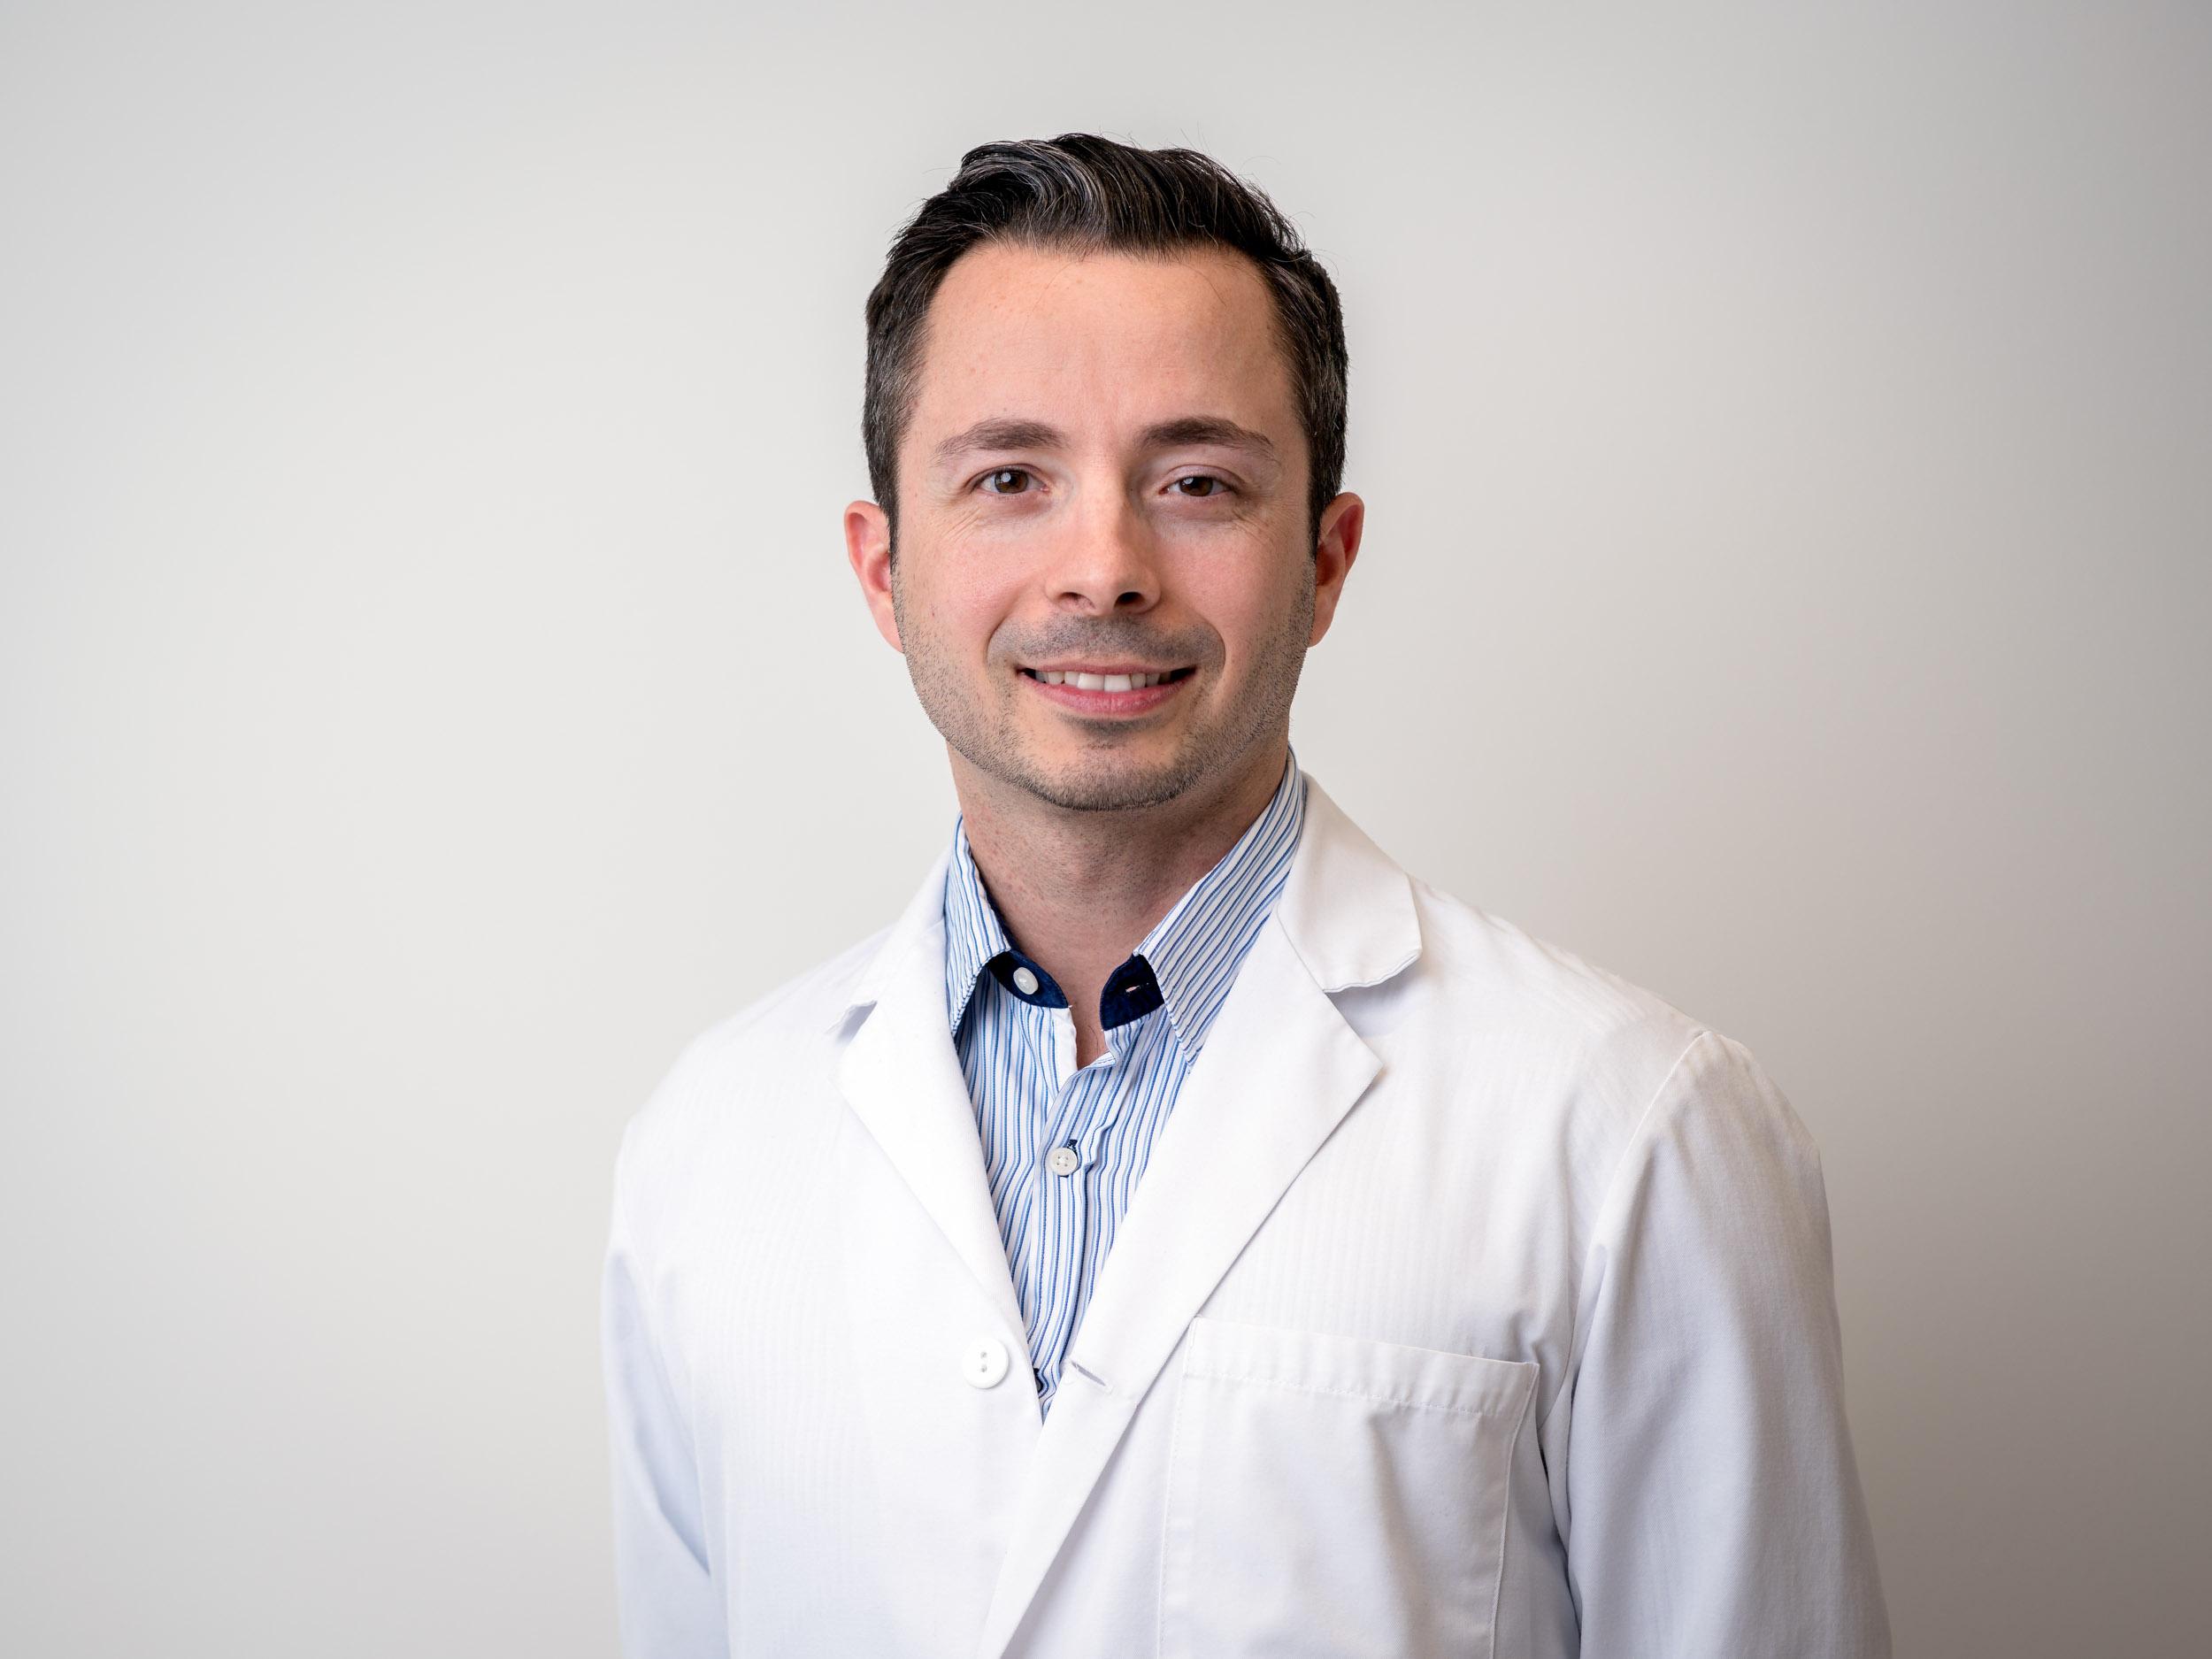 Dermatologie Klinik Zürich - Dr. med. Piotr J. Michel-Dziunycz